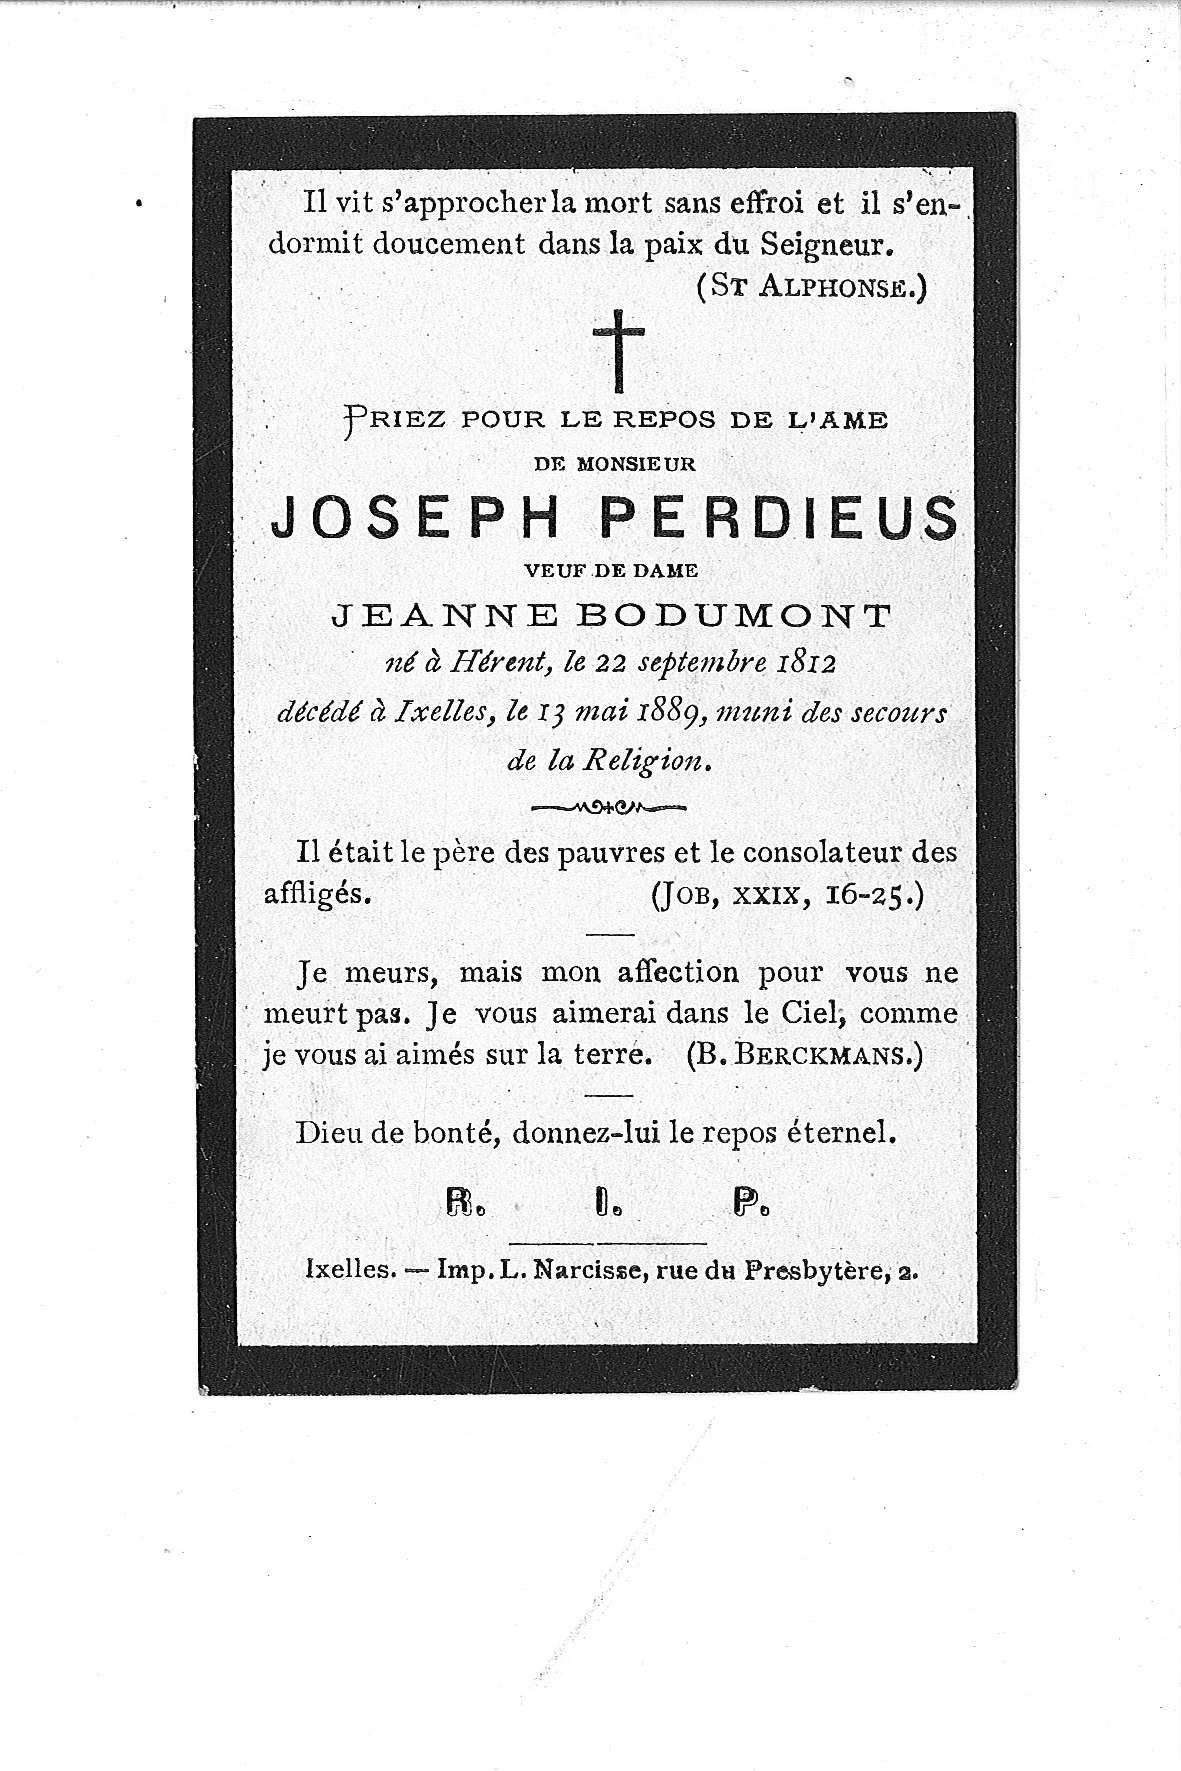 Joseph(1889)20100407113039_00047.jpg